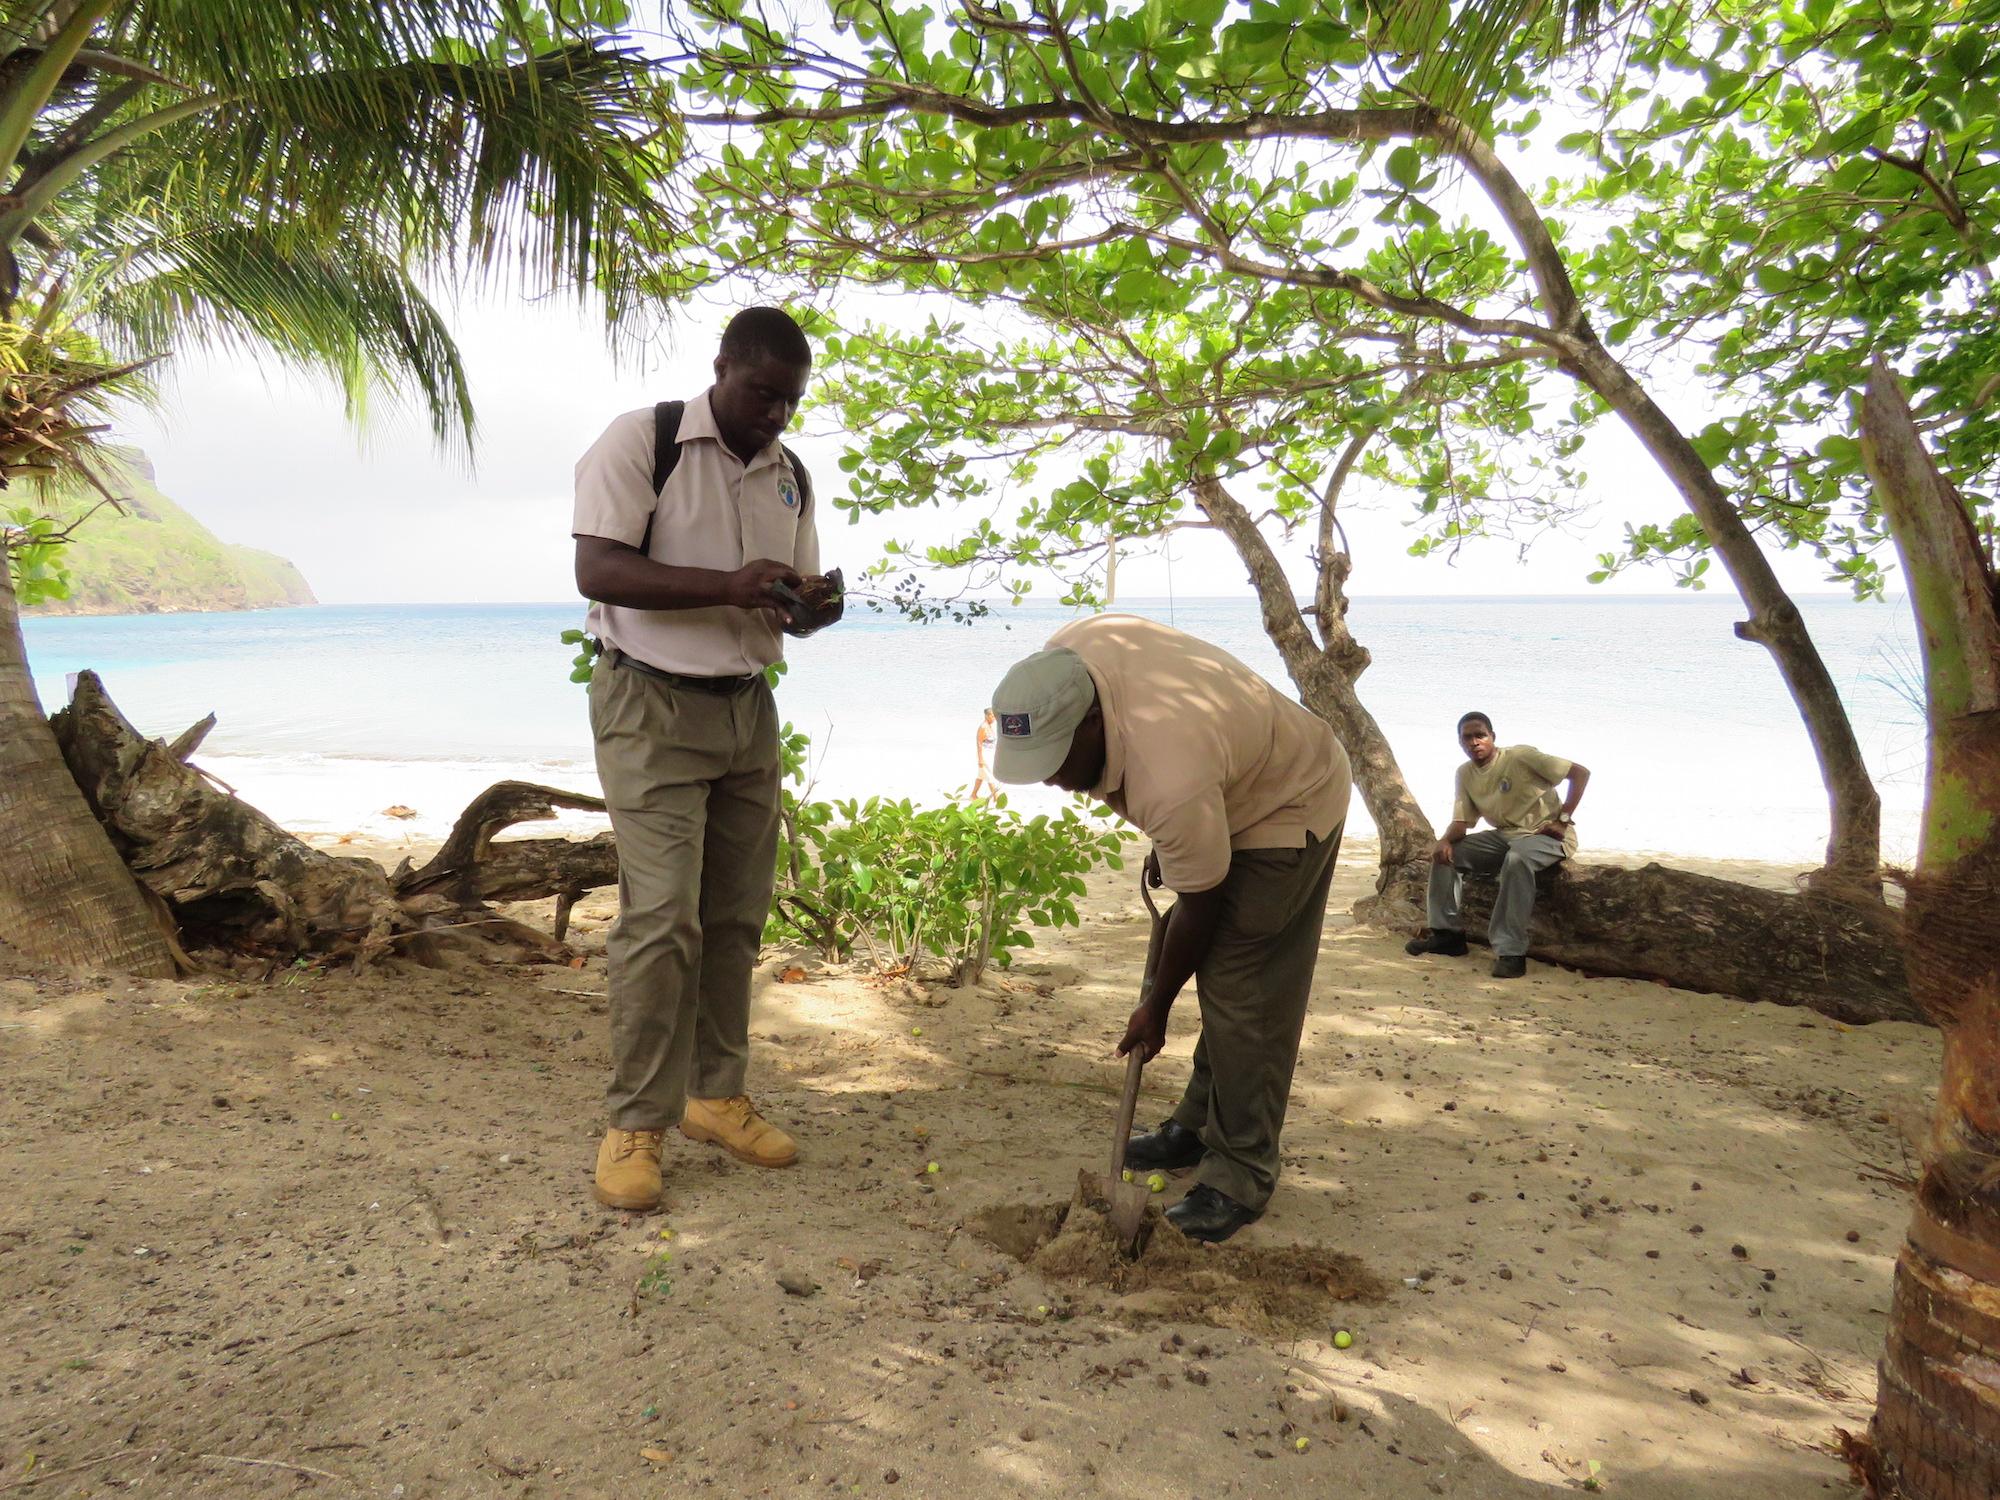 Forestry rangers plant neem trees to prevent beach erosion